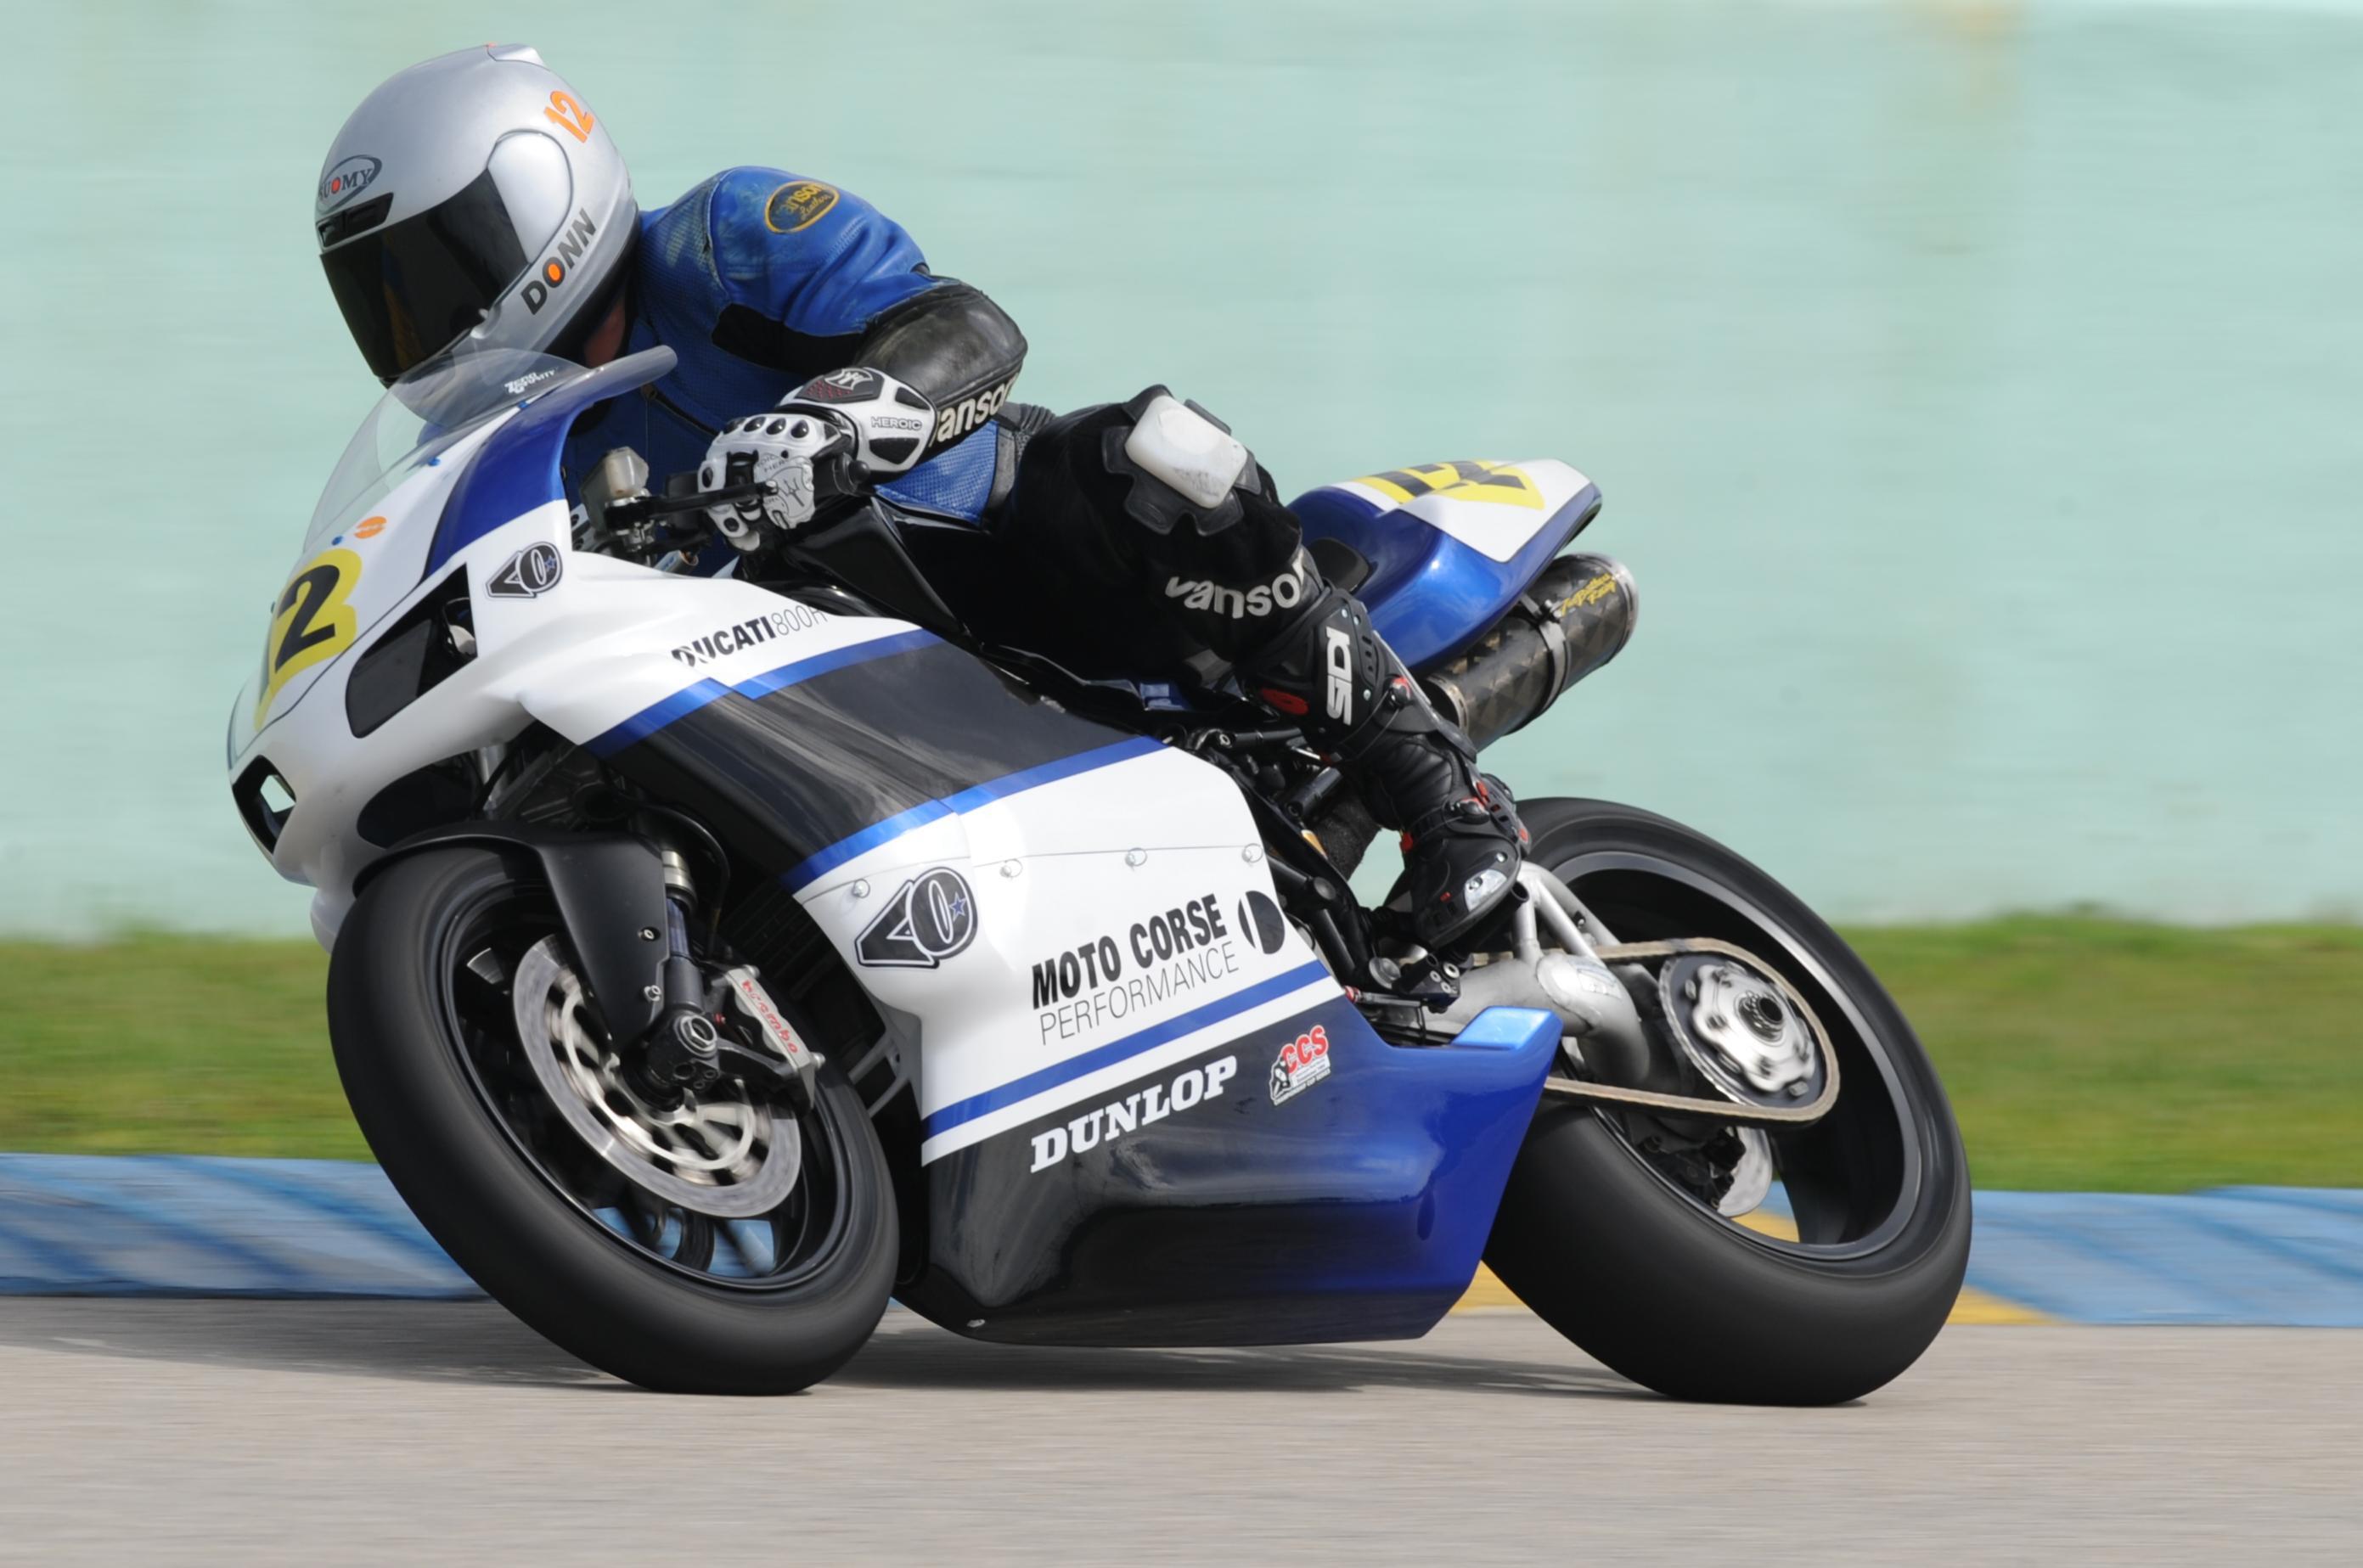 Ducati Deux soupapes - Page 6 97701d1316225795-monster-1100-evo-track-012-01-